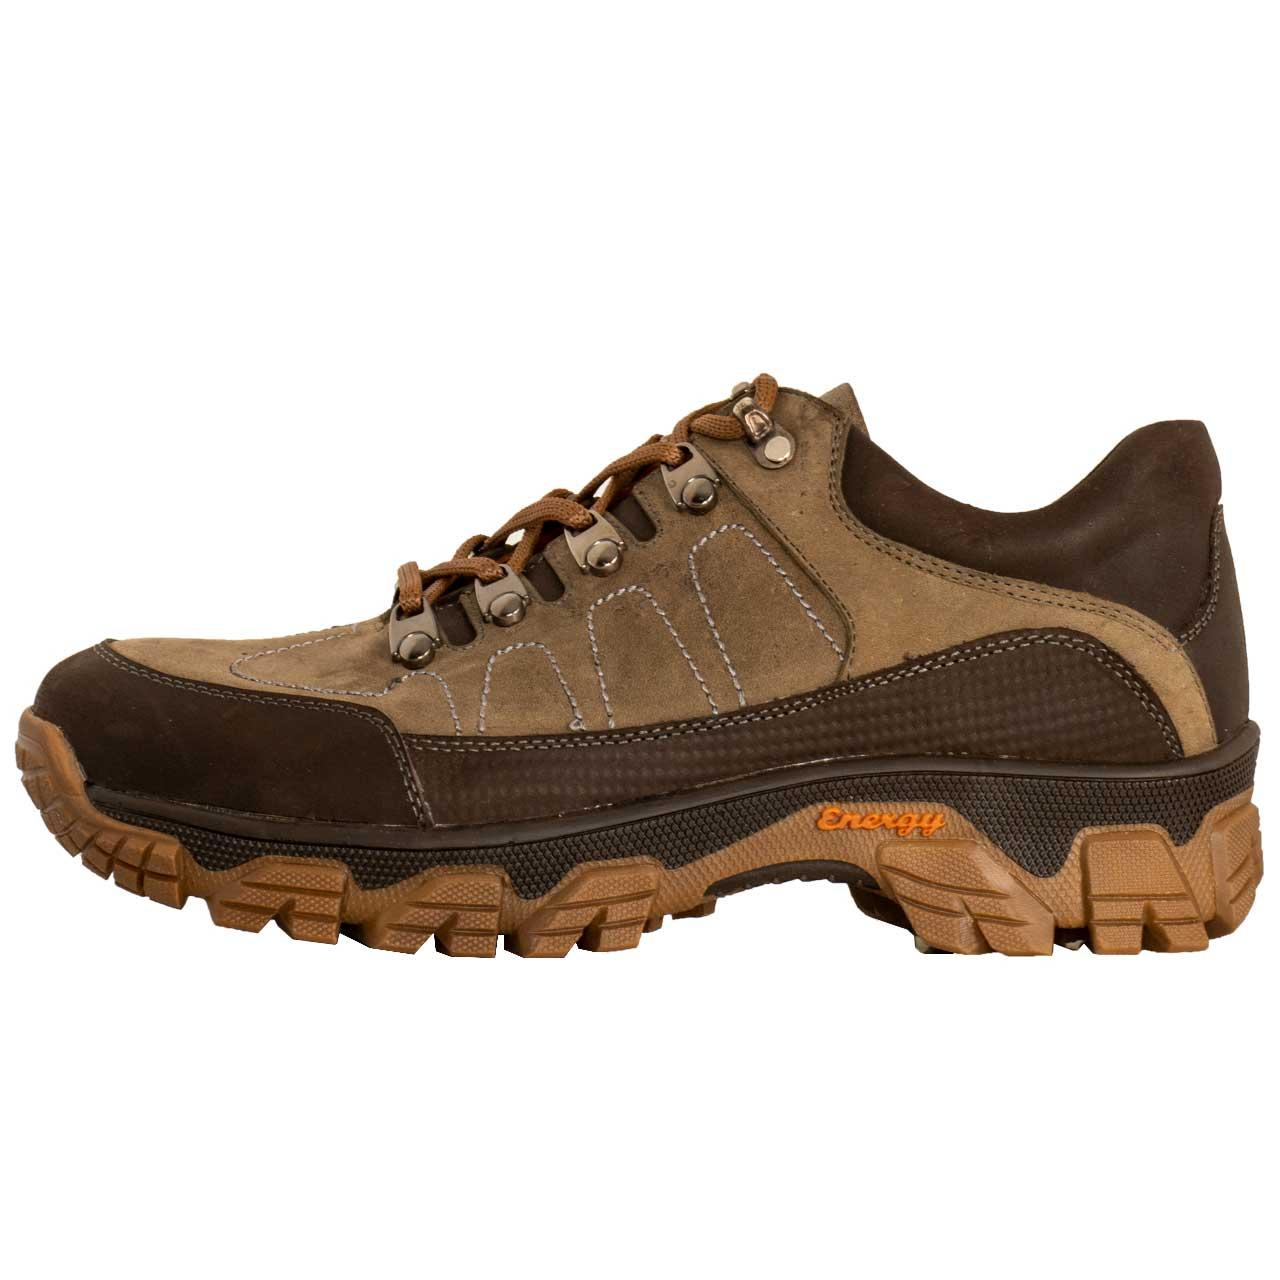 PARINECHARM leather men's hiking boots ,SHO221-8  Model